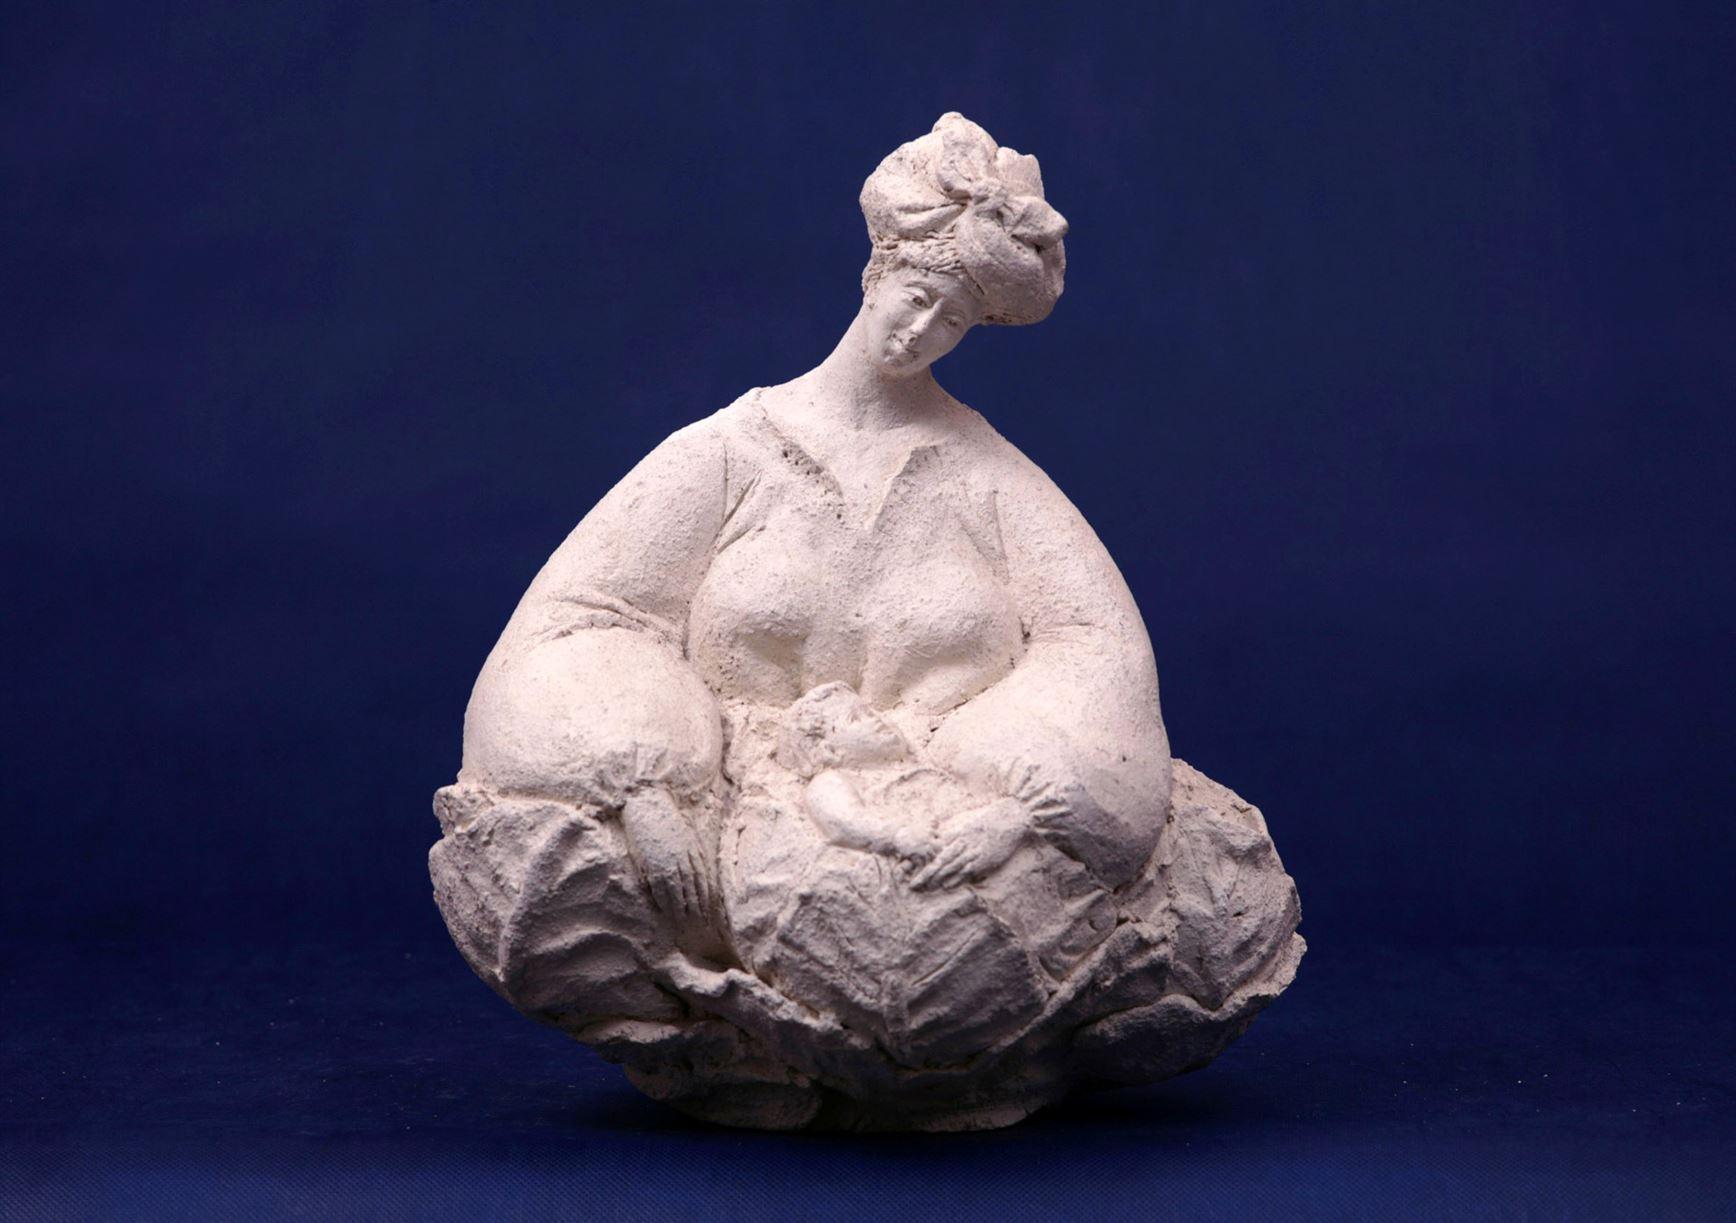 скульптура женщины